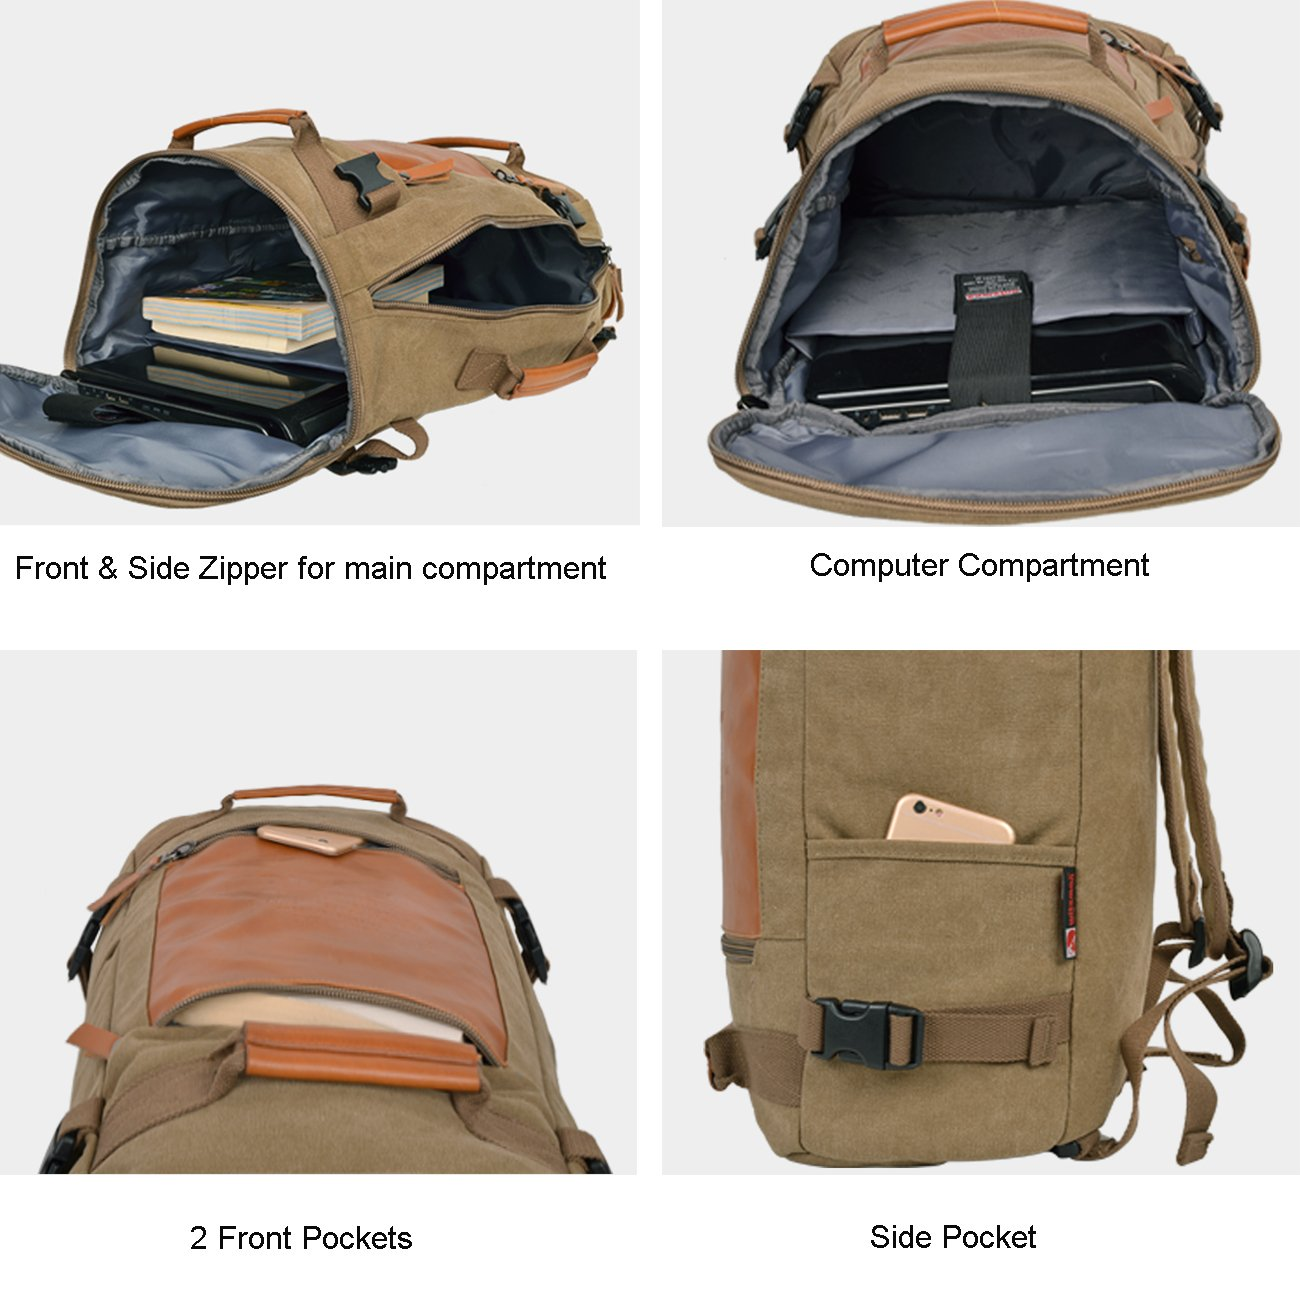 WITZMAN Men Vintage Canvas Rucksack Travel Duffel Backpack Retro Hiking Bag 2033 (19 inch Green) by WITZMAN (Image #6)